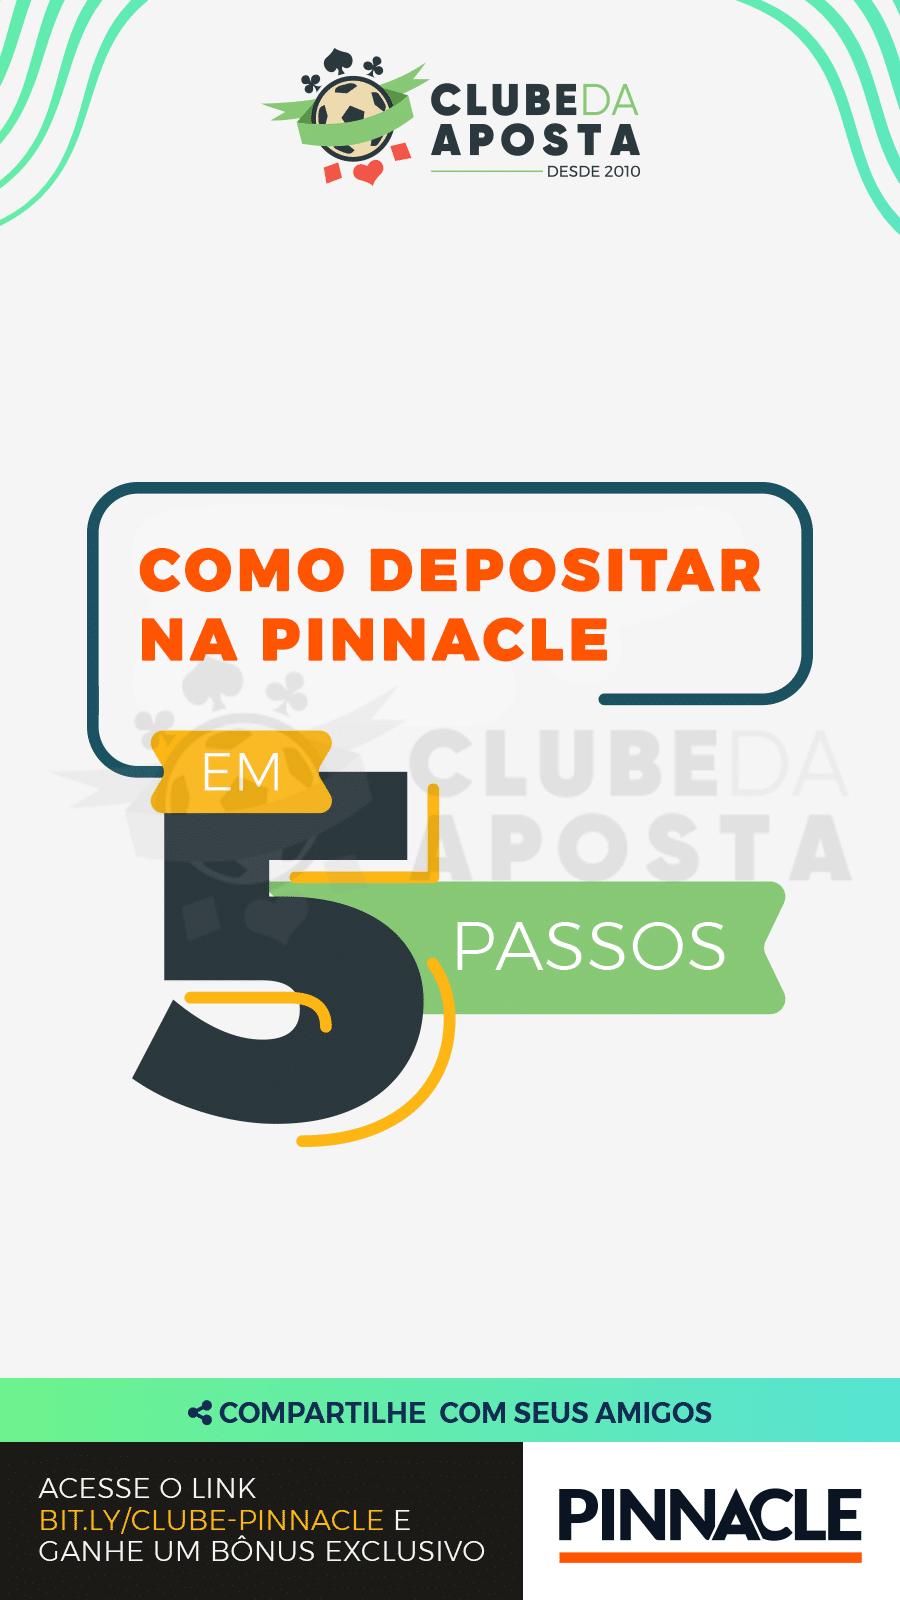 como-depositar-na-pinnacle_passos